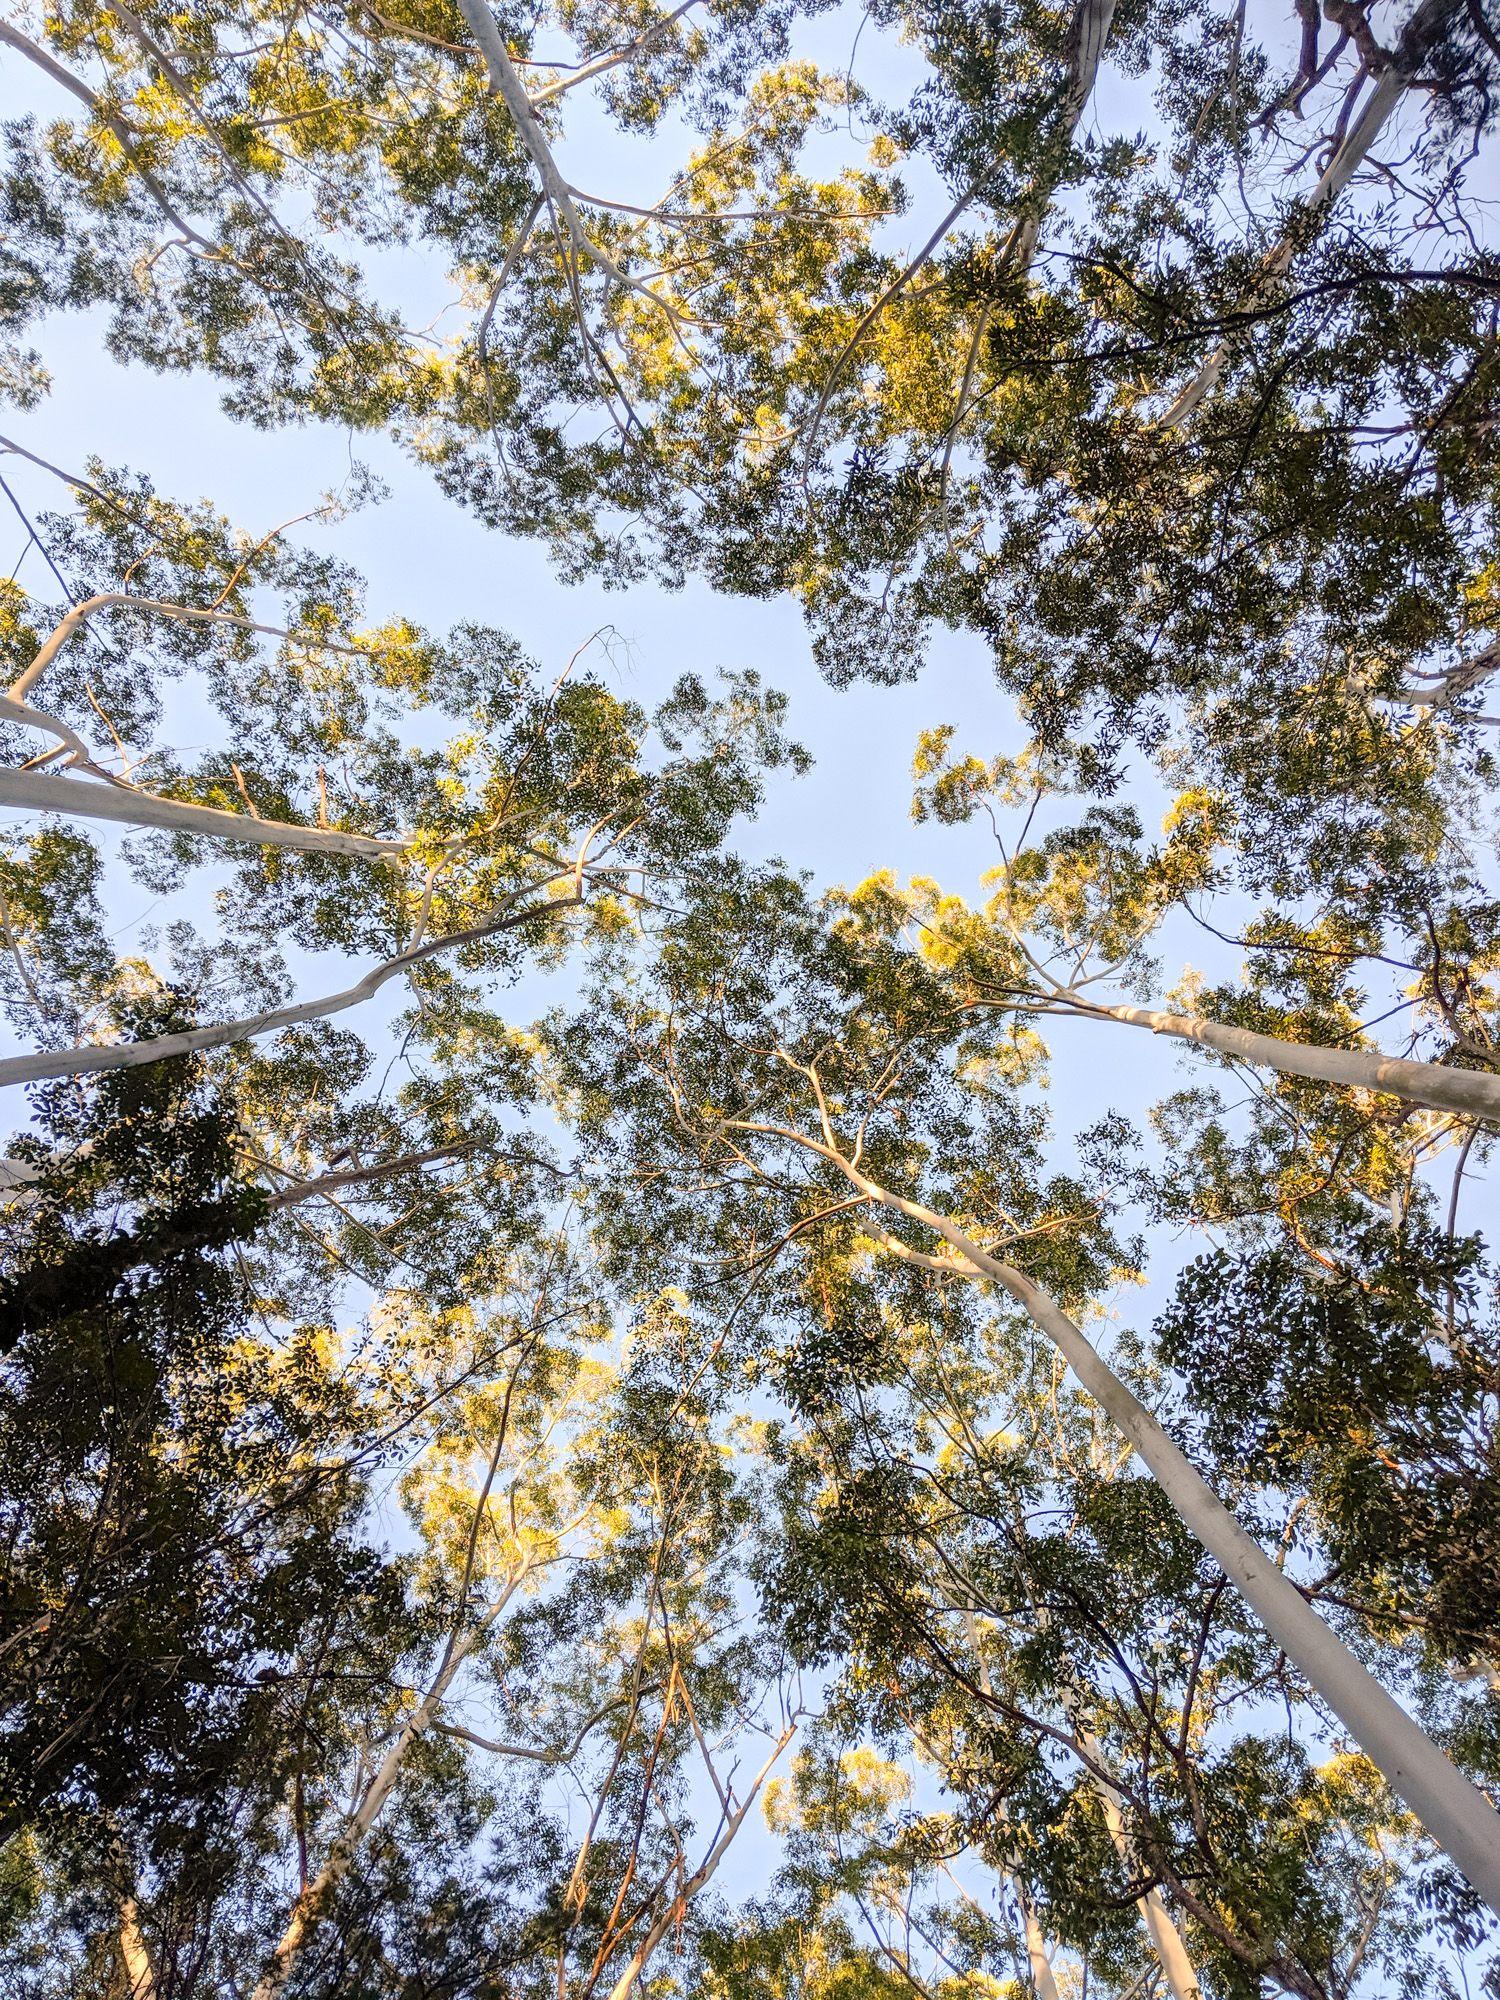 benham track gumtrees